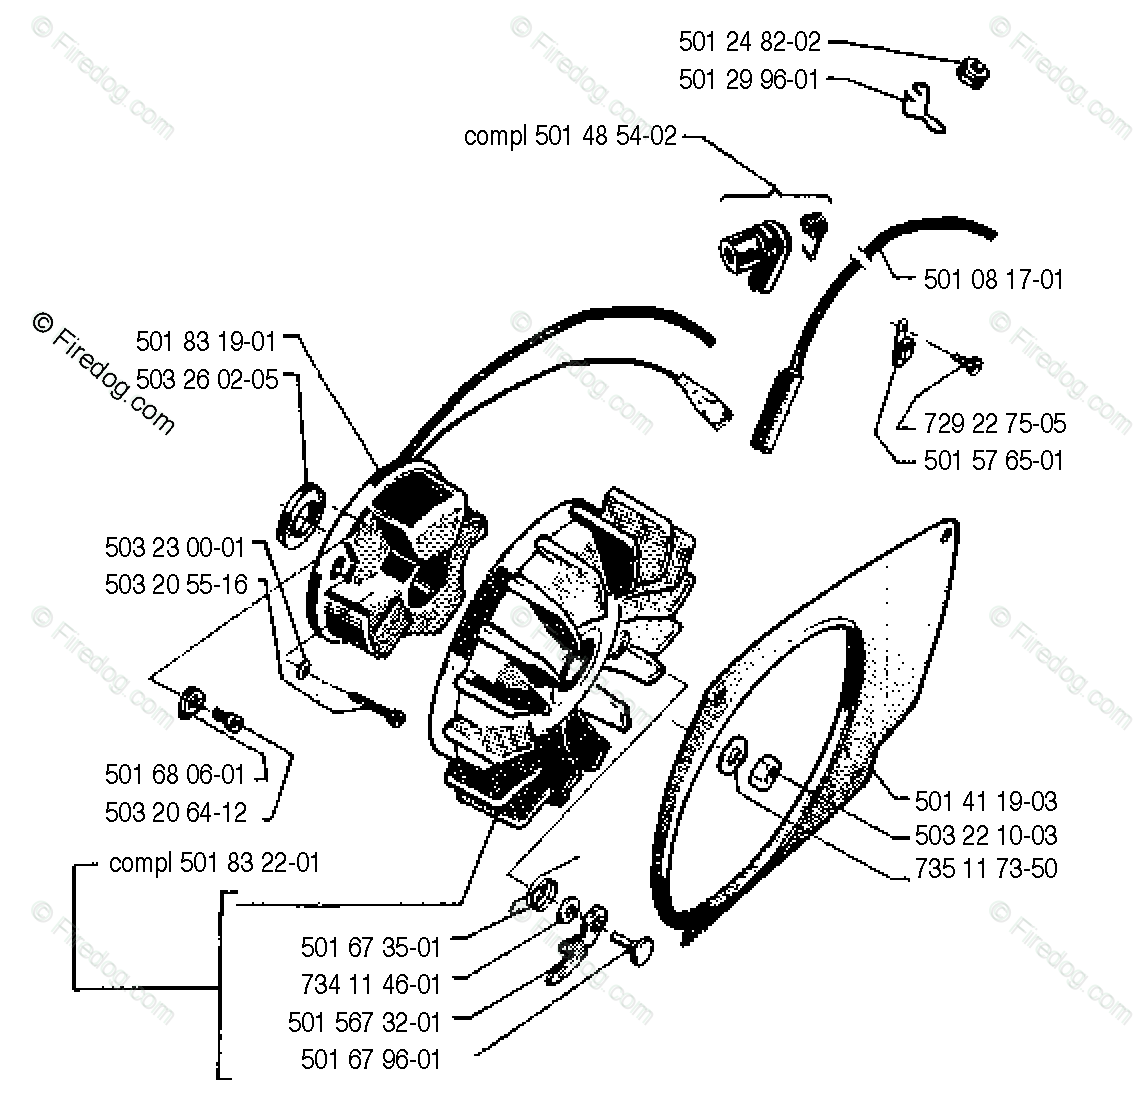 Husqvarna Chain Saw 2101 (1990-06) OEM Parts Diagram for